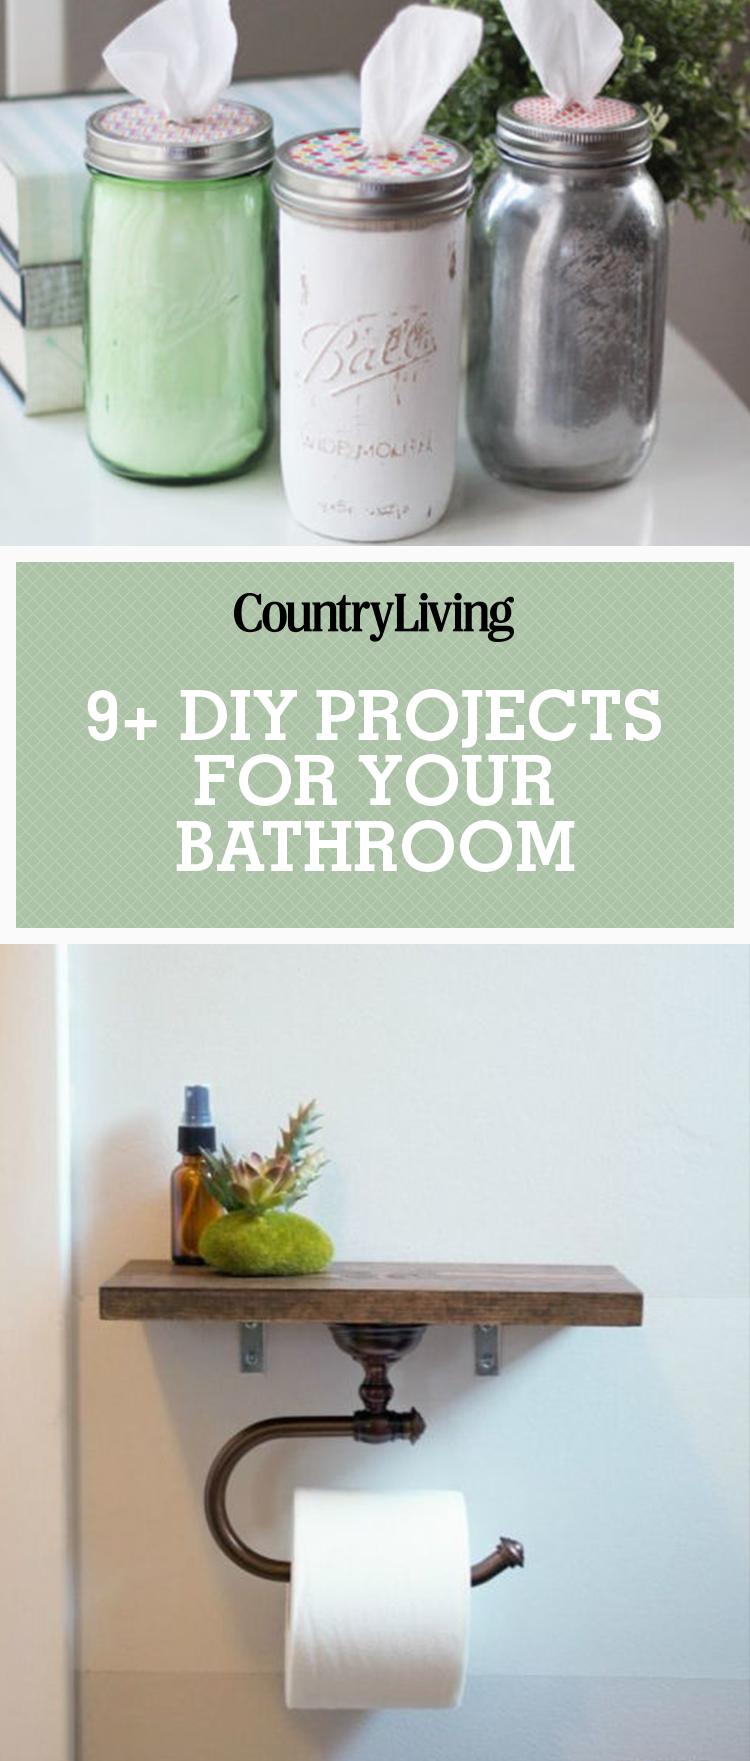 Diy bathroom projects - Diy Bathroom Projects 31